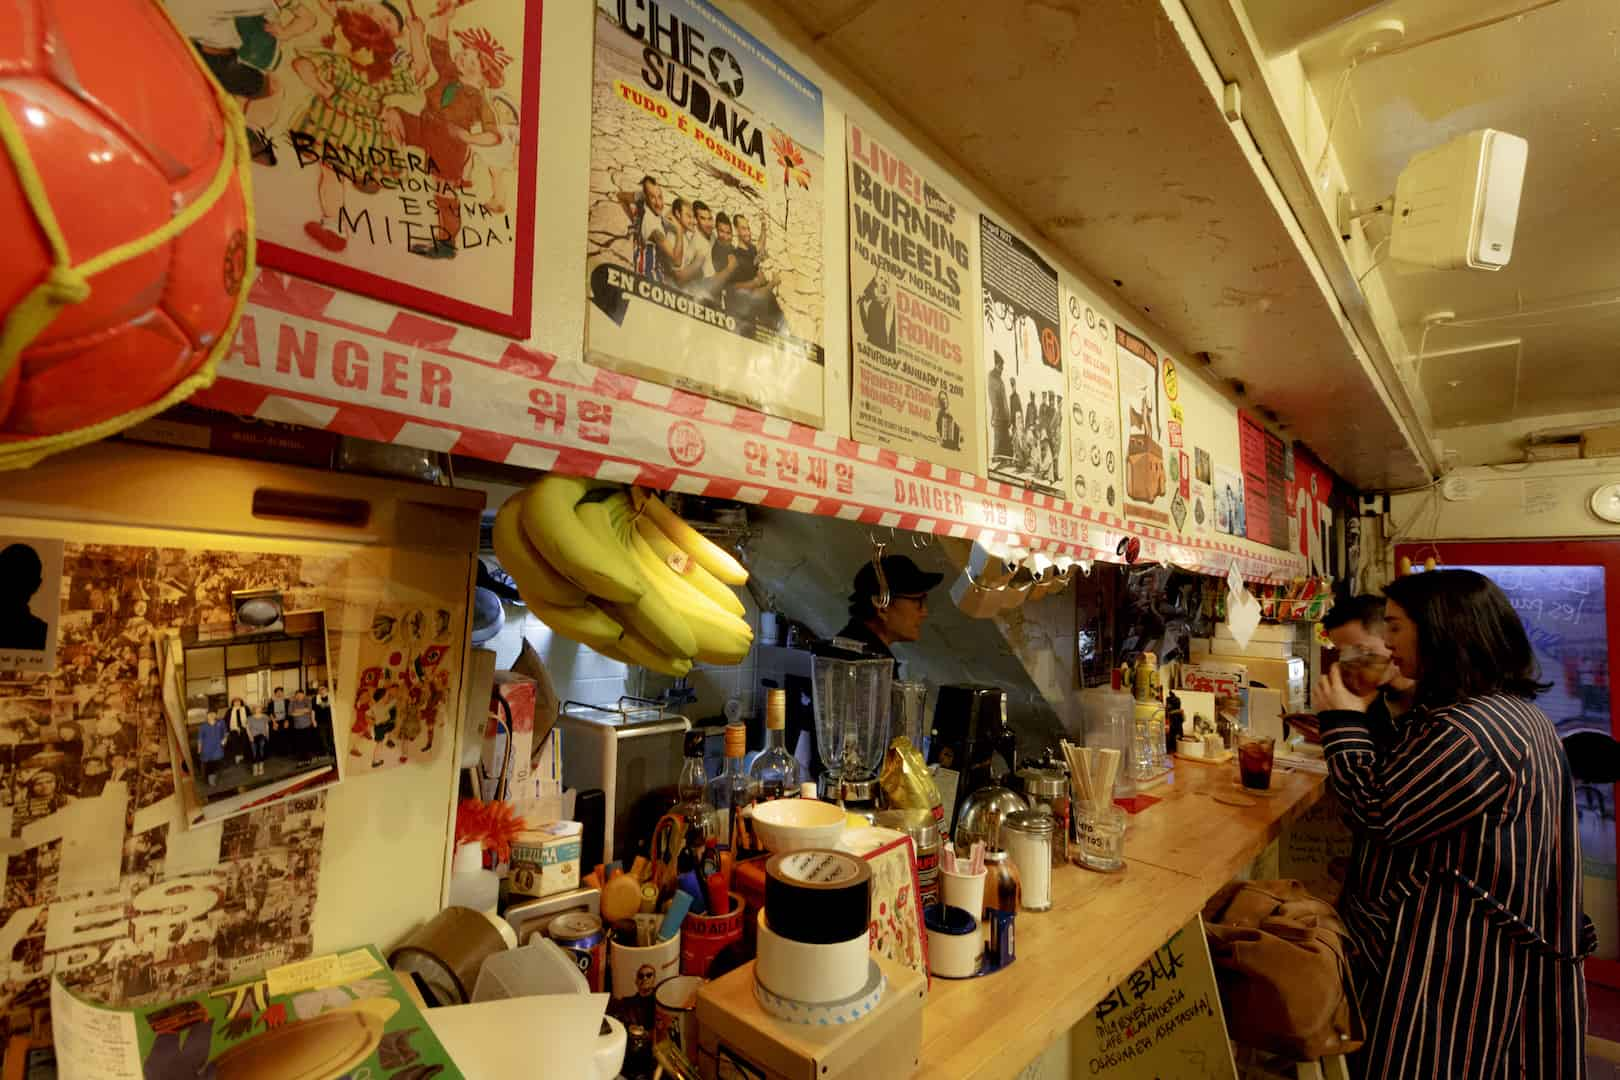 LGBT Cafe in Tokyo : เรนโบว์ เบอร์ริโต โดโมะ (Rainbow Burritos Doumo)